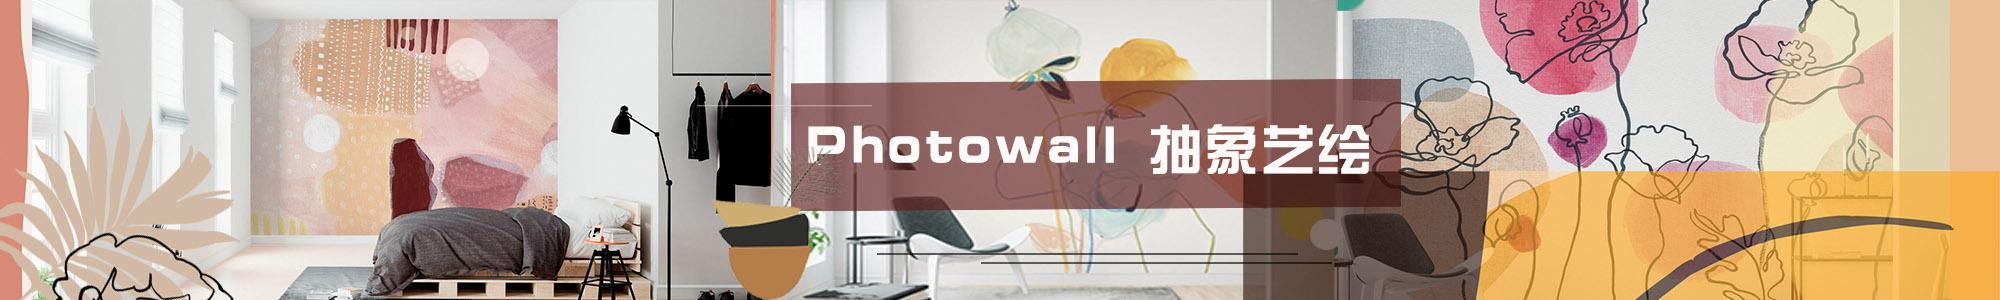 Photowall 抽象艺绘